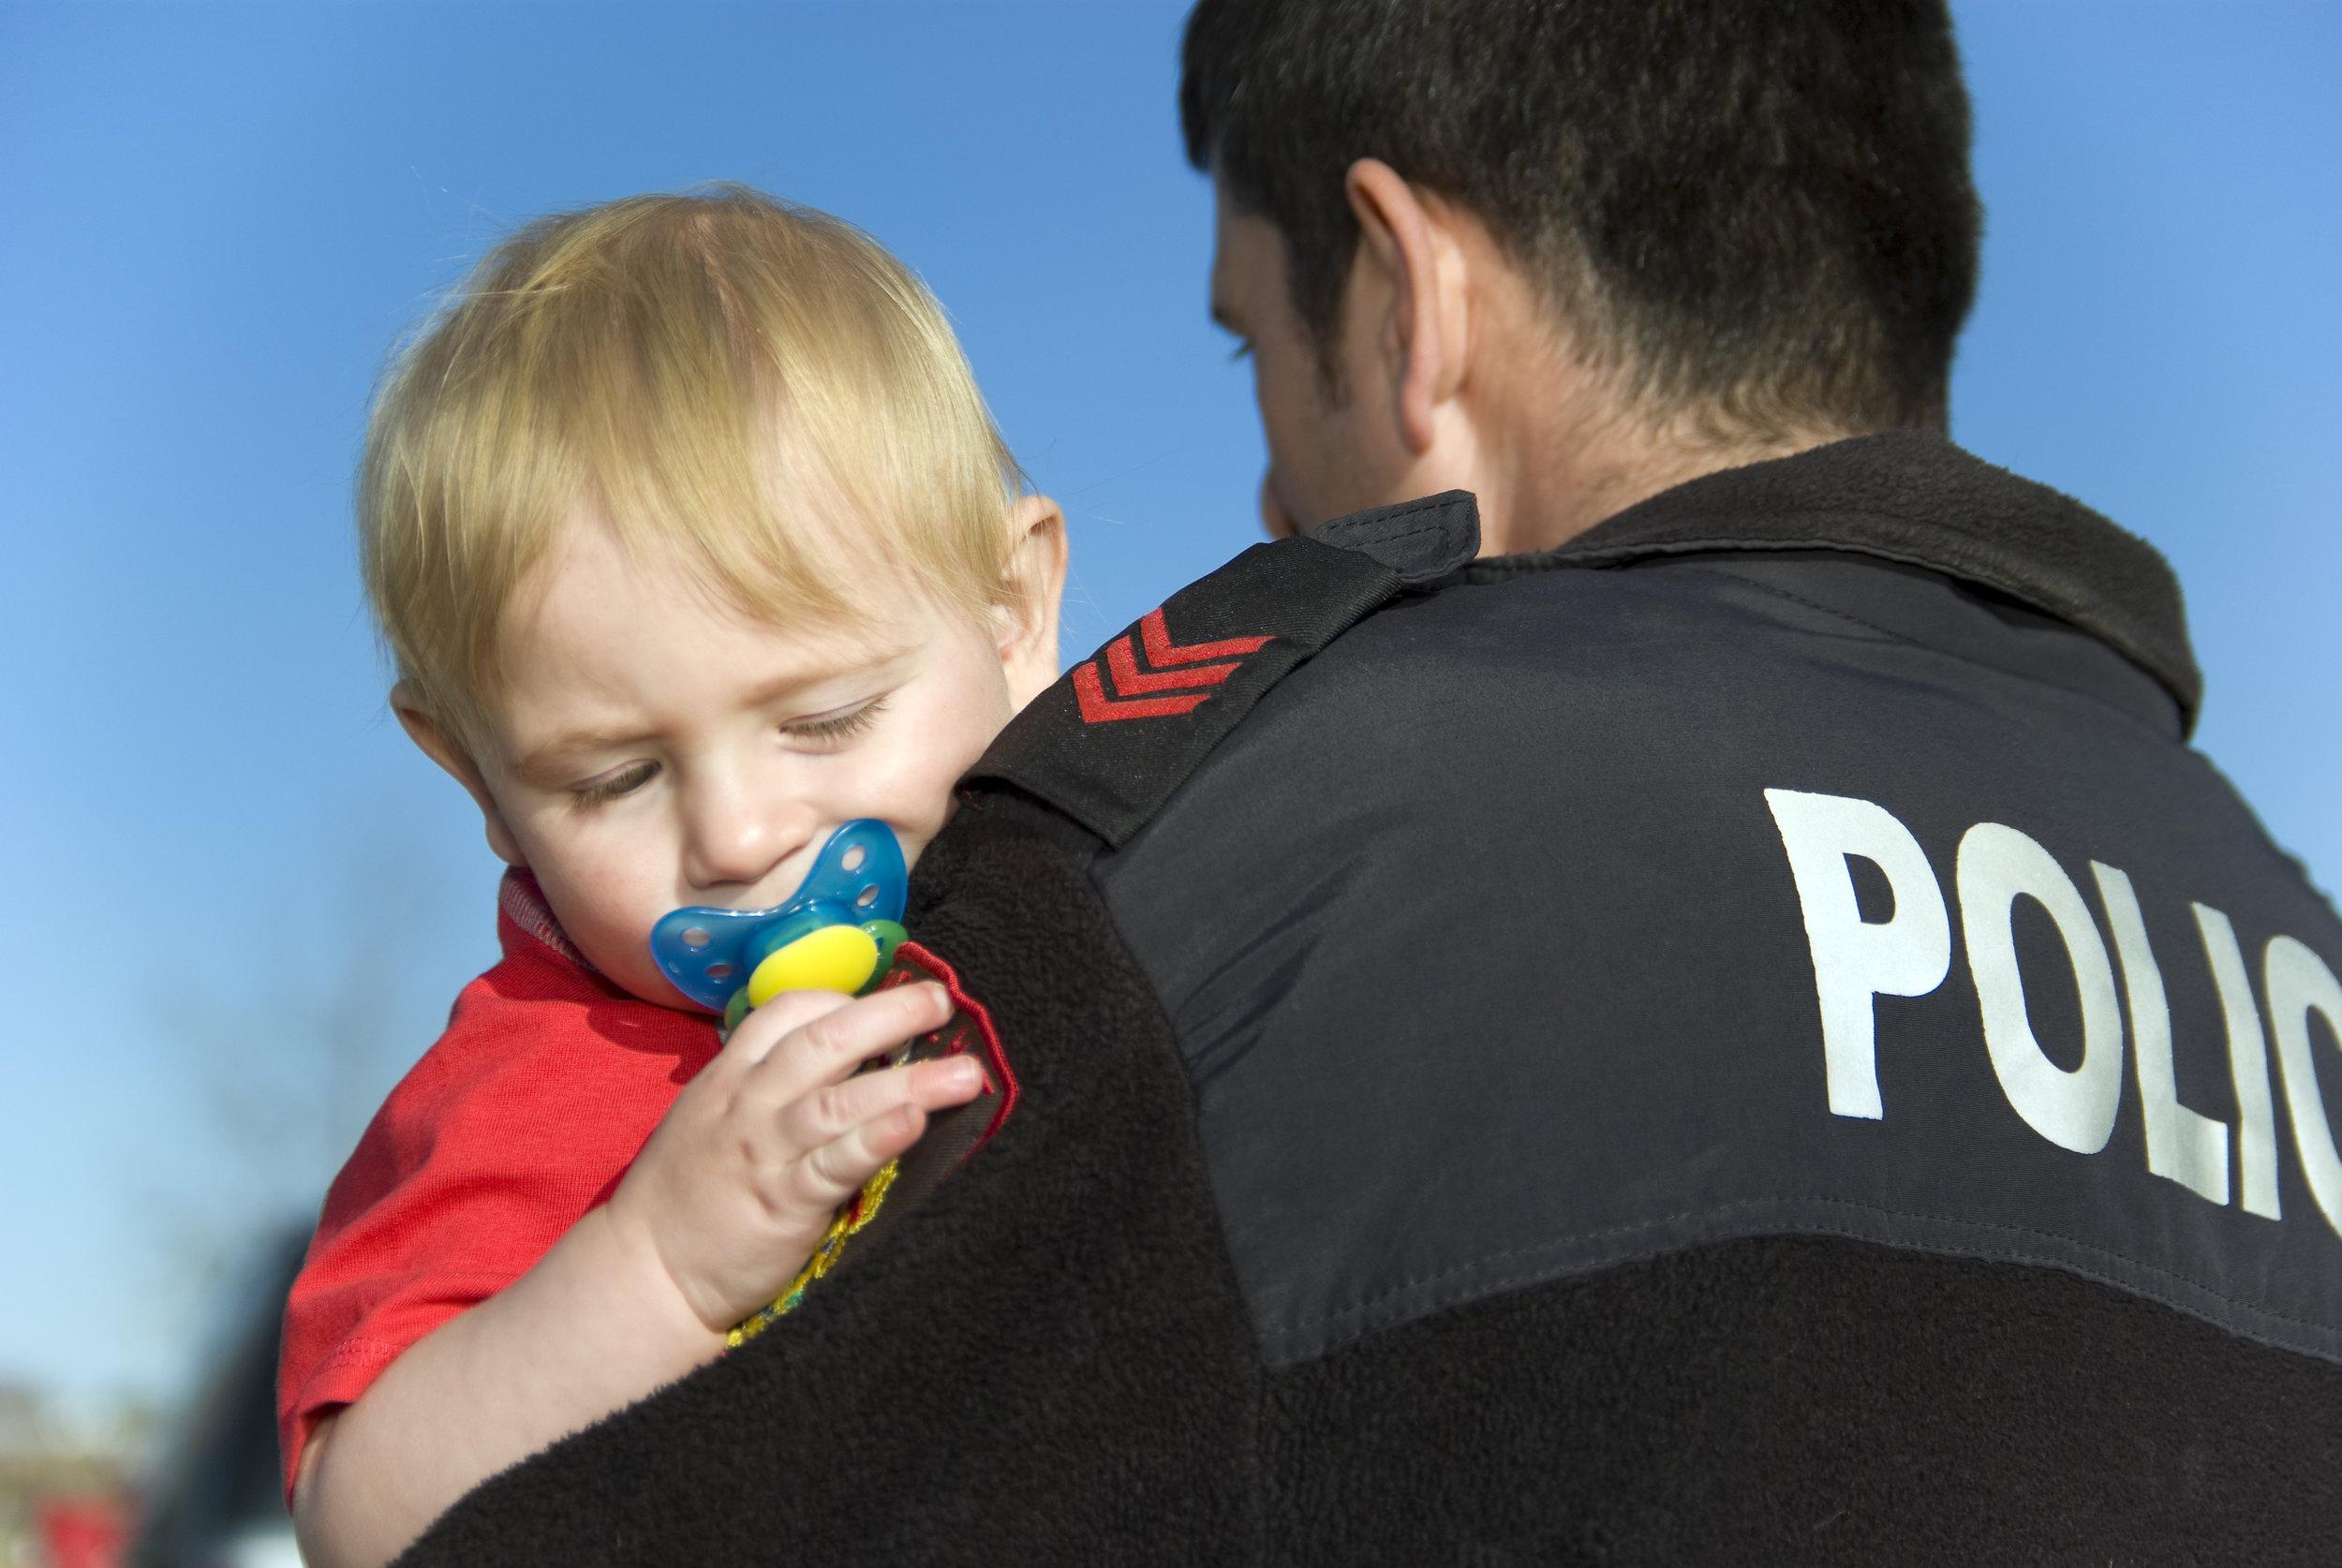 police_child.jpeg